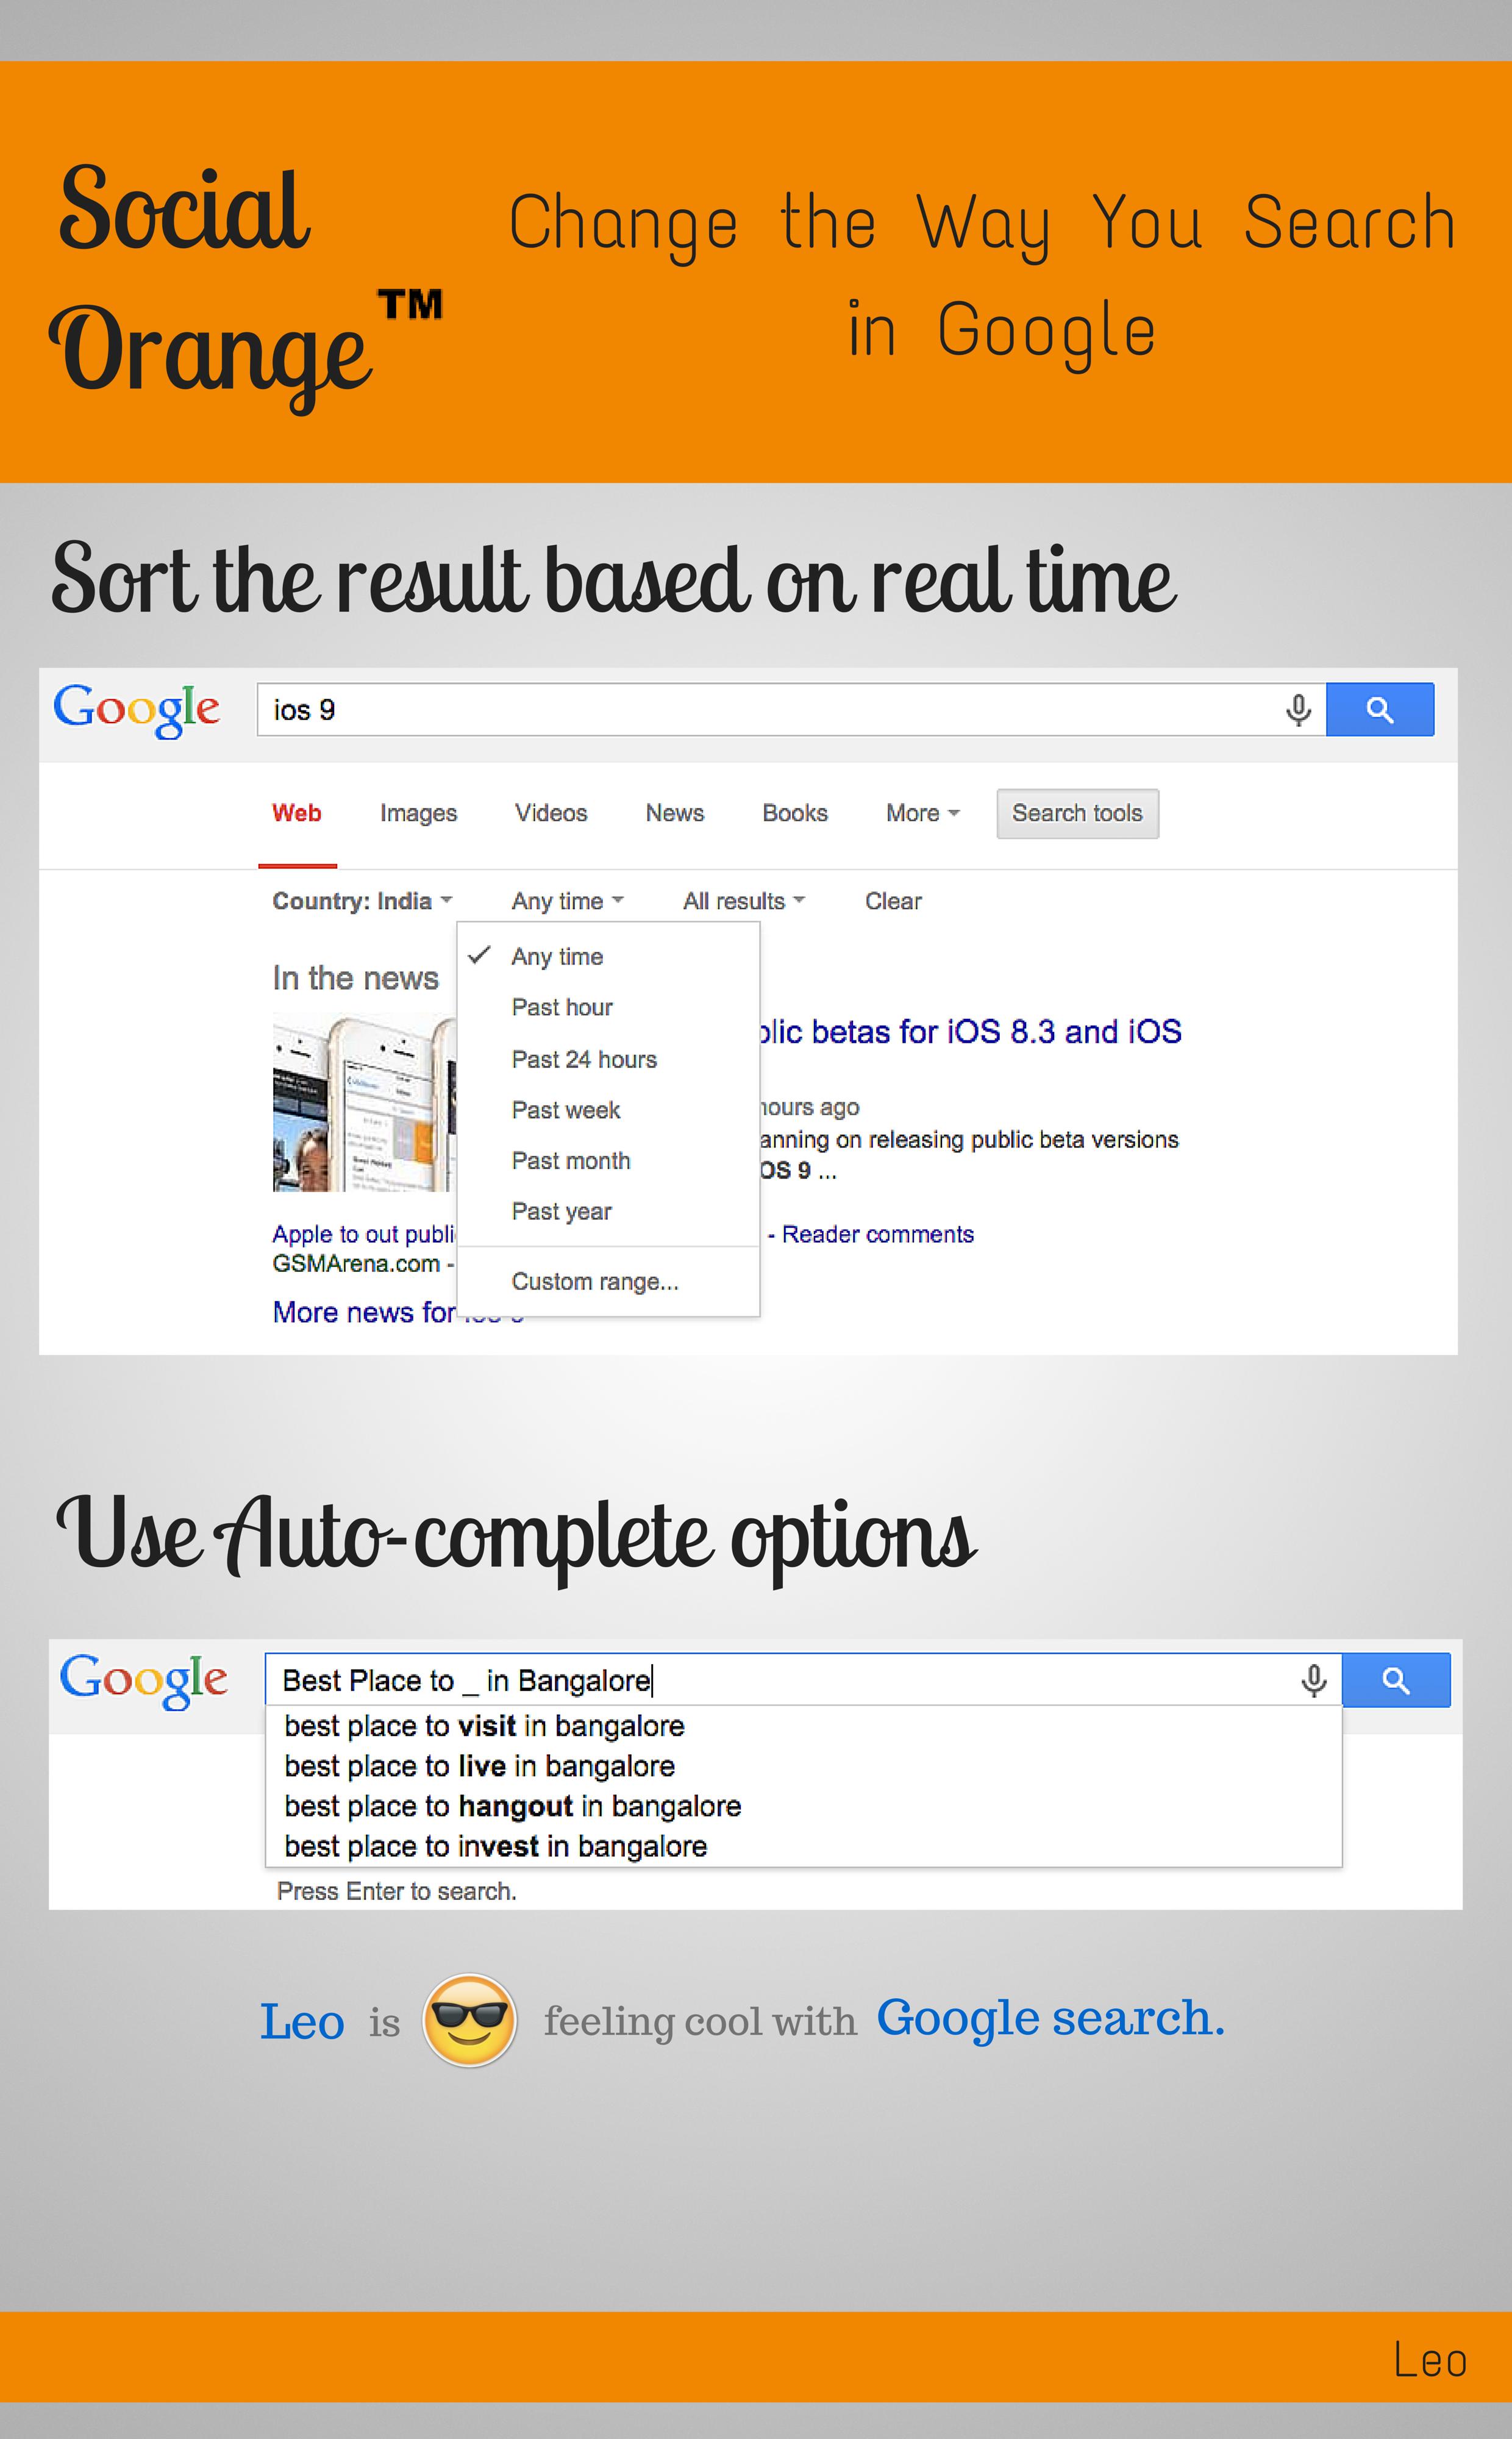 Change the way you search in Google  - SocialOrange